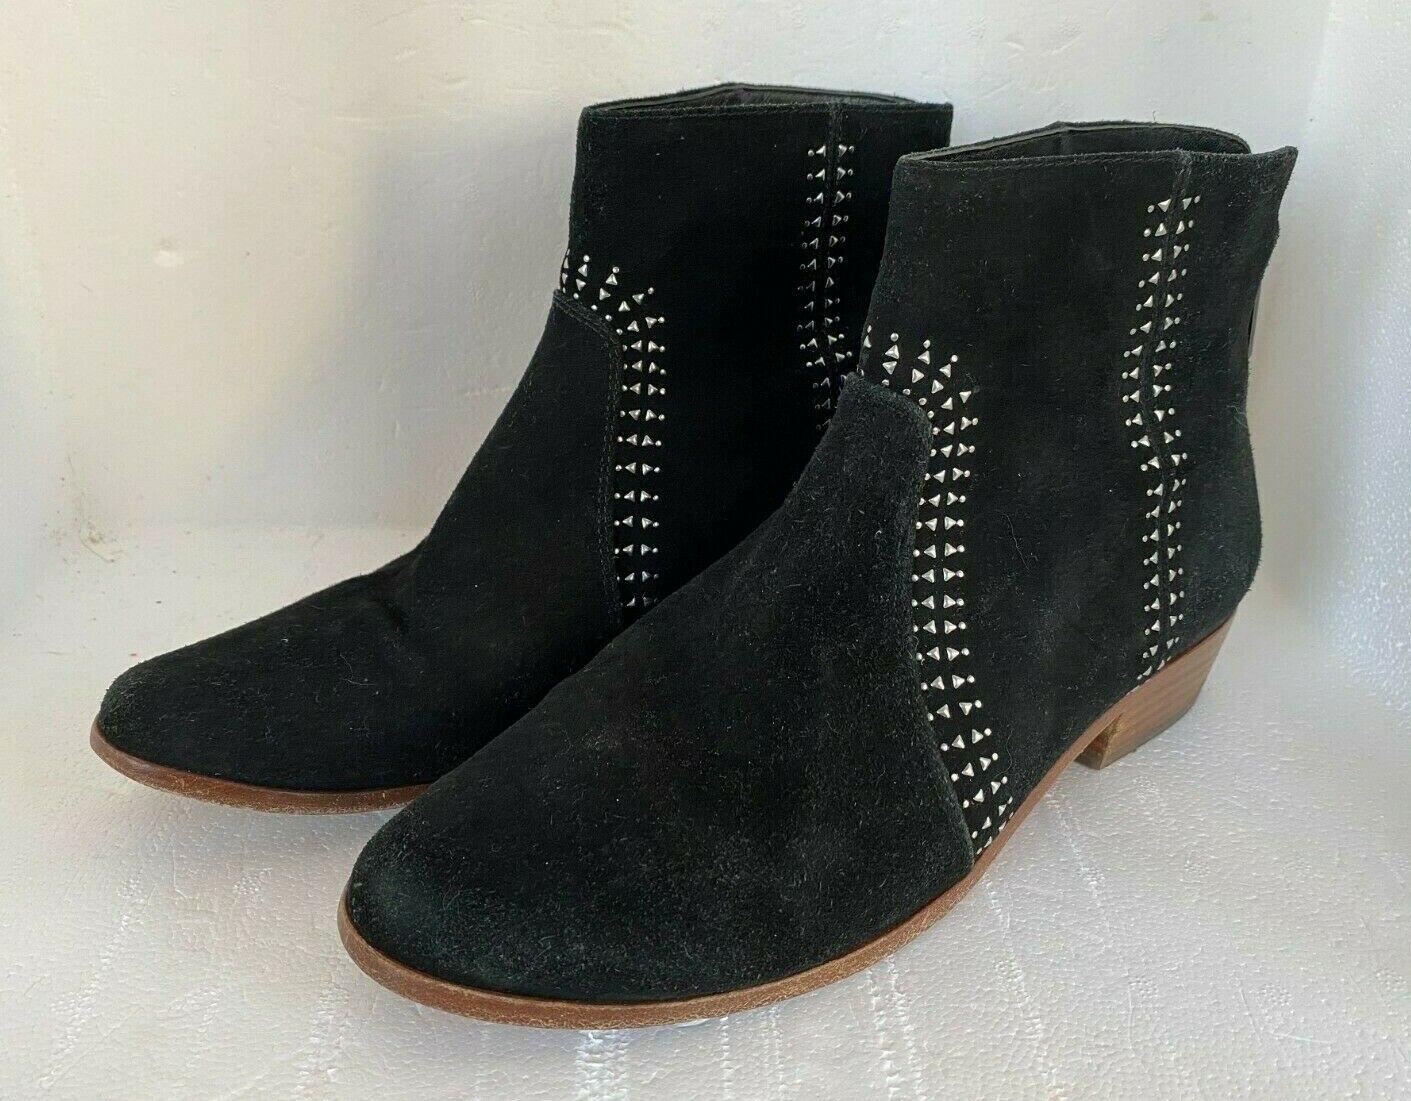 JOIE Lucy Women's Studded Black Suede Leather Ankle Boots Rocker Sz EU 39/US 8.5